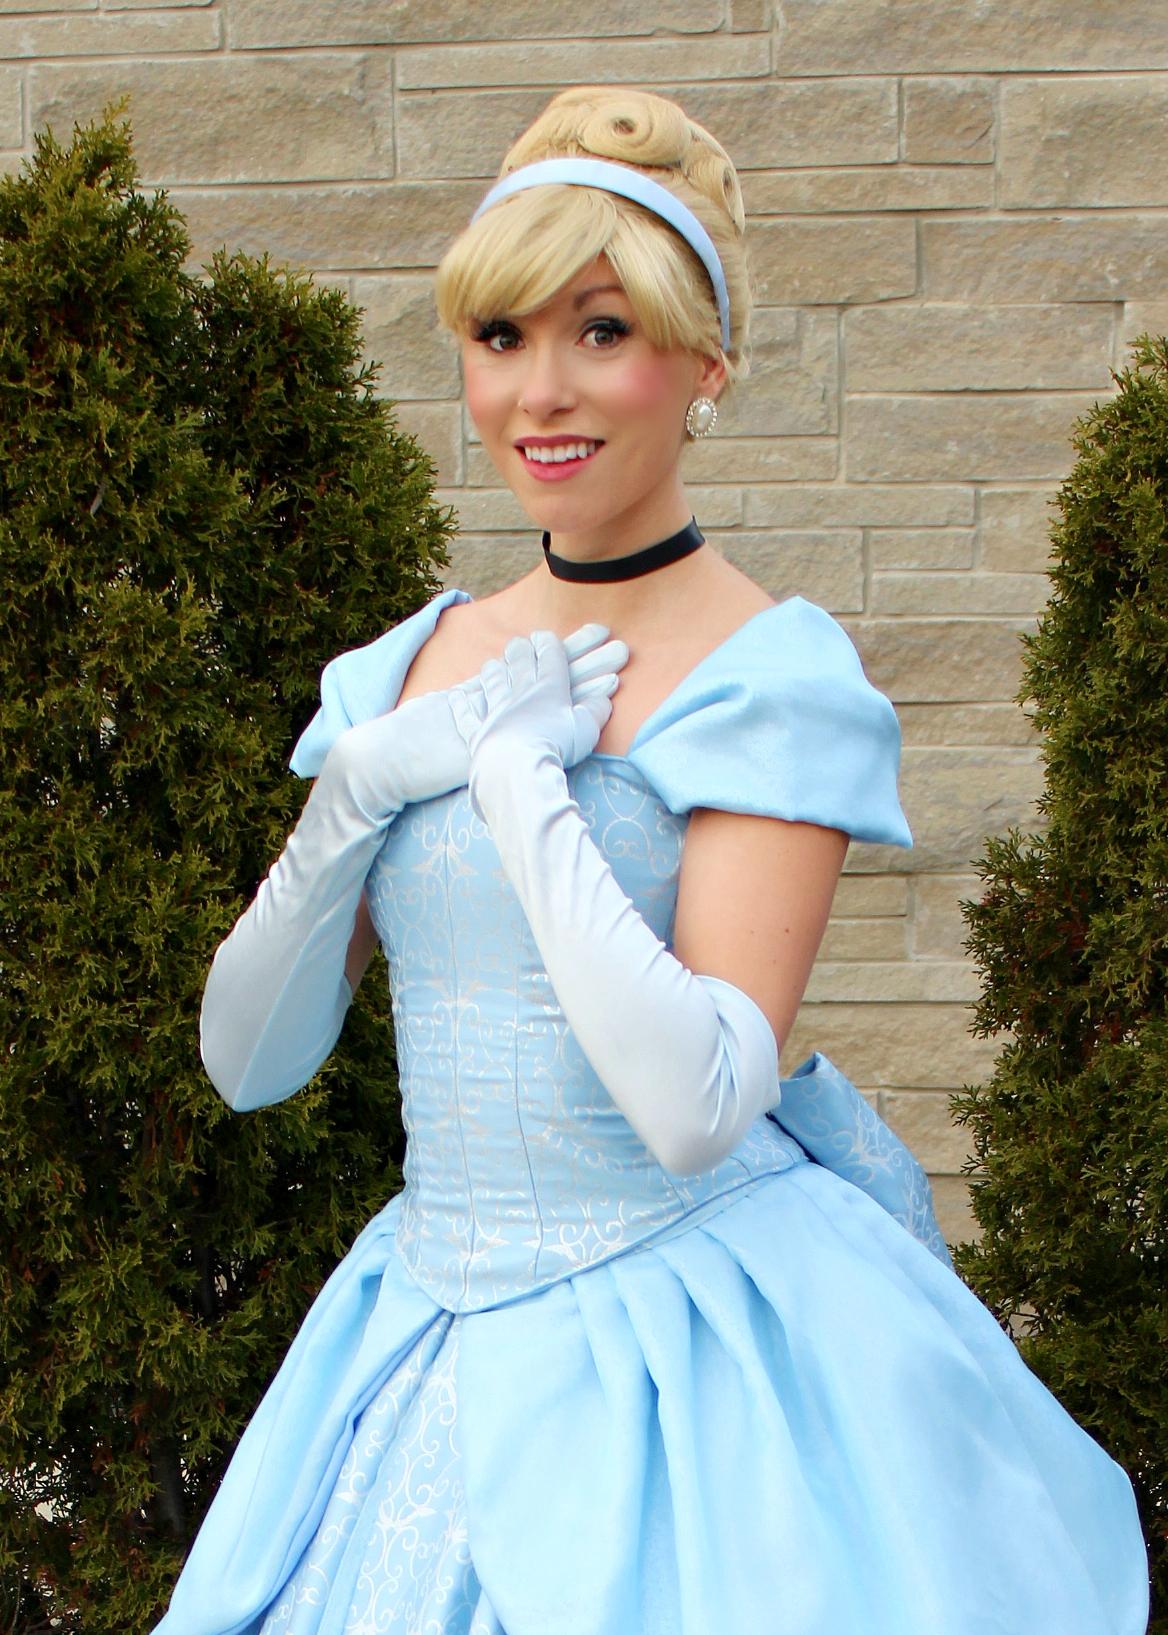 Cinderella parks once upon a princess pa